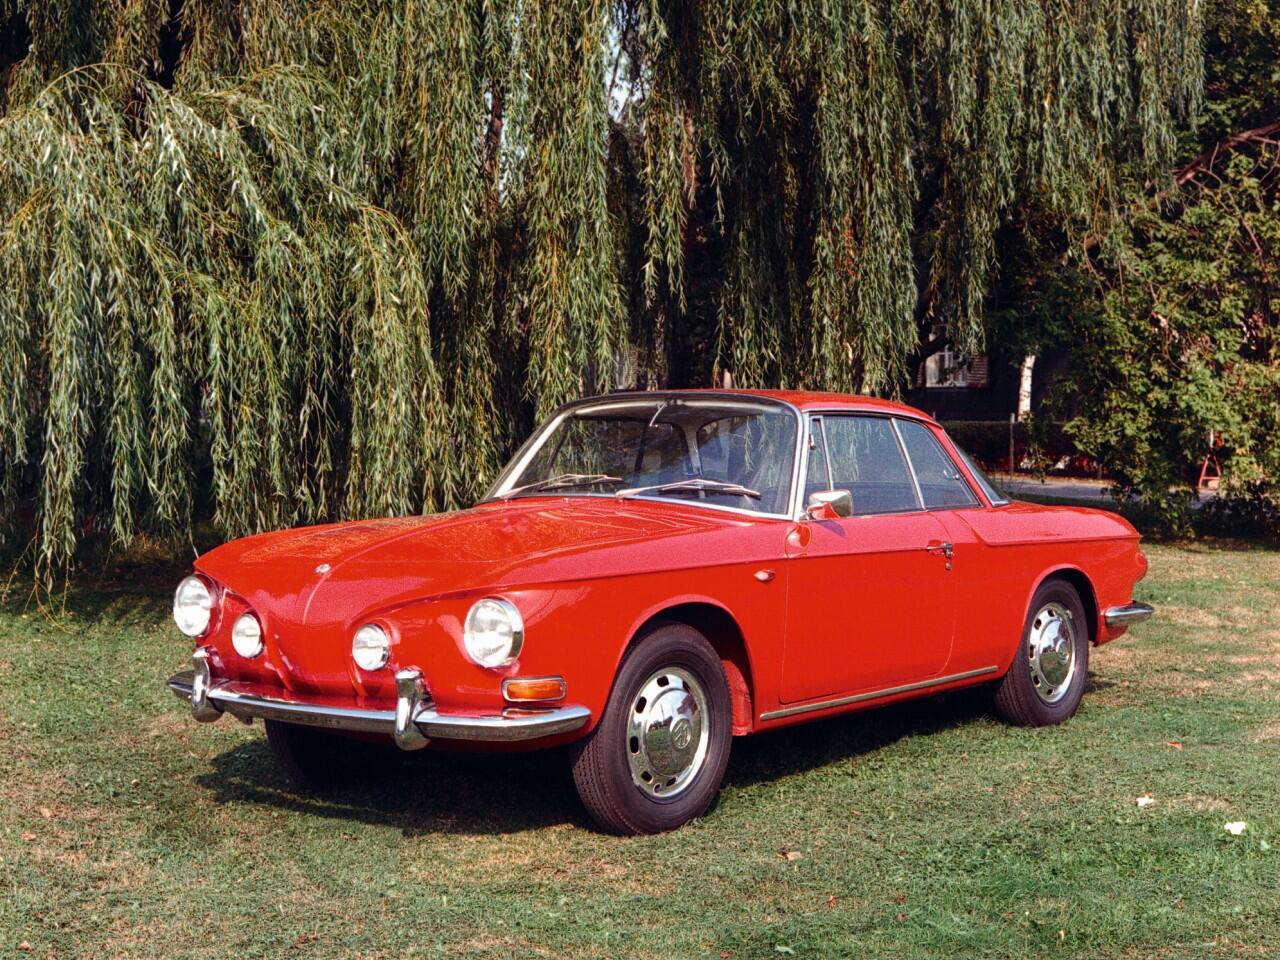 Bild zu VW Karmann Ghia Coupé von 1969